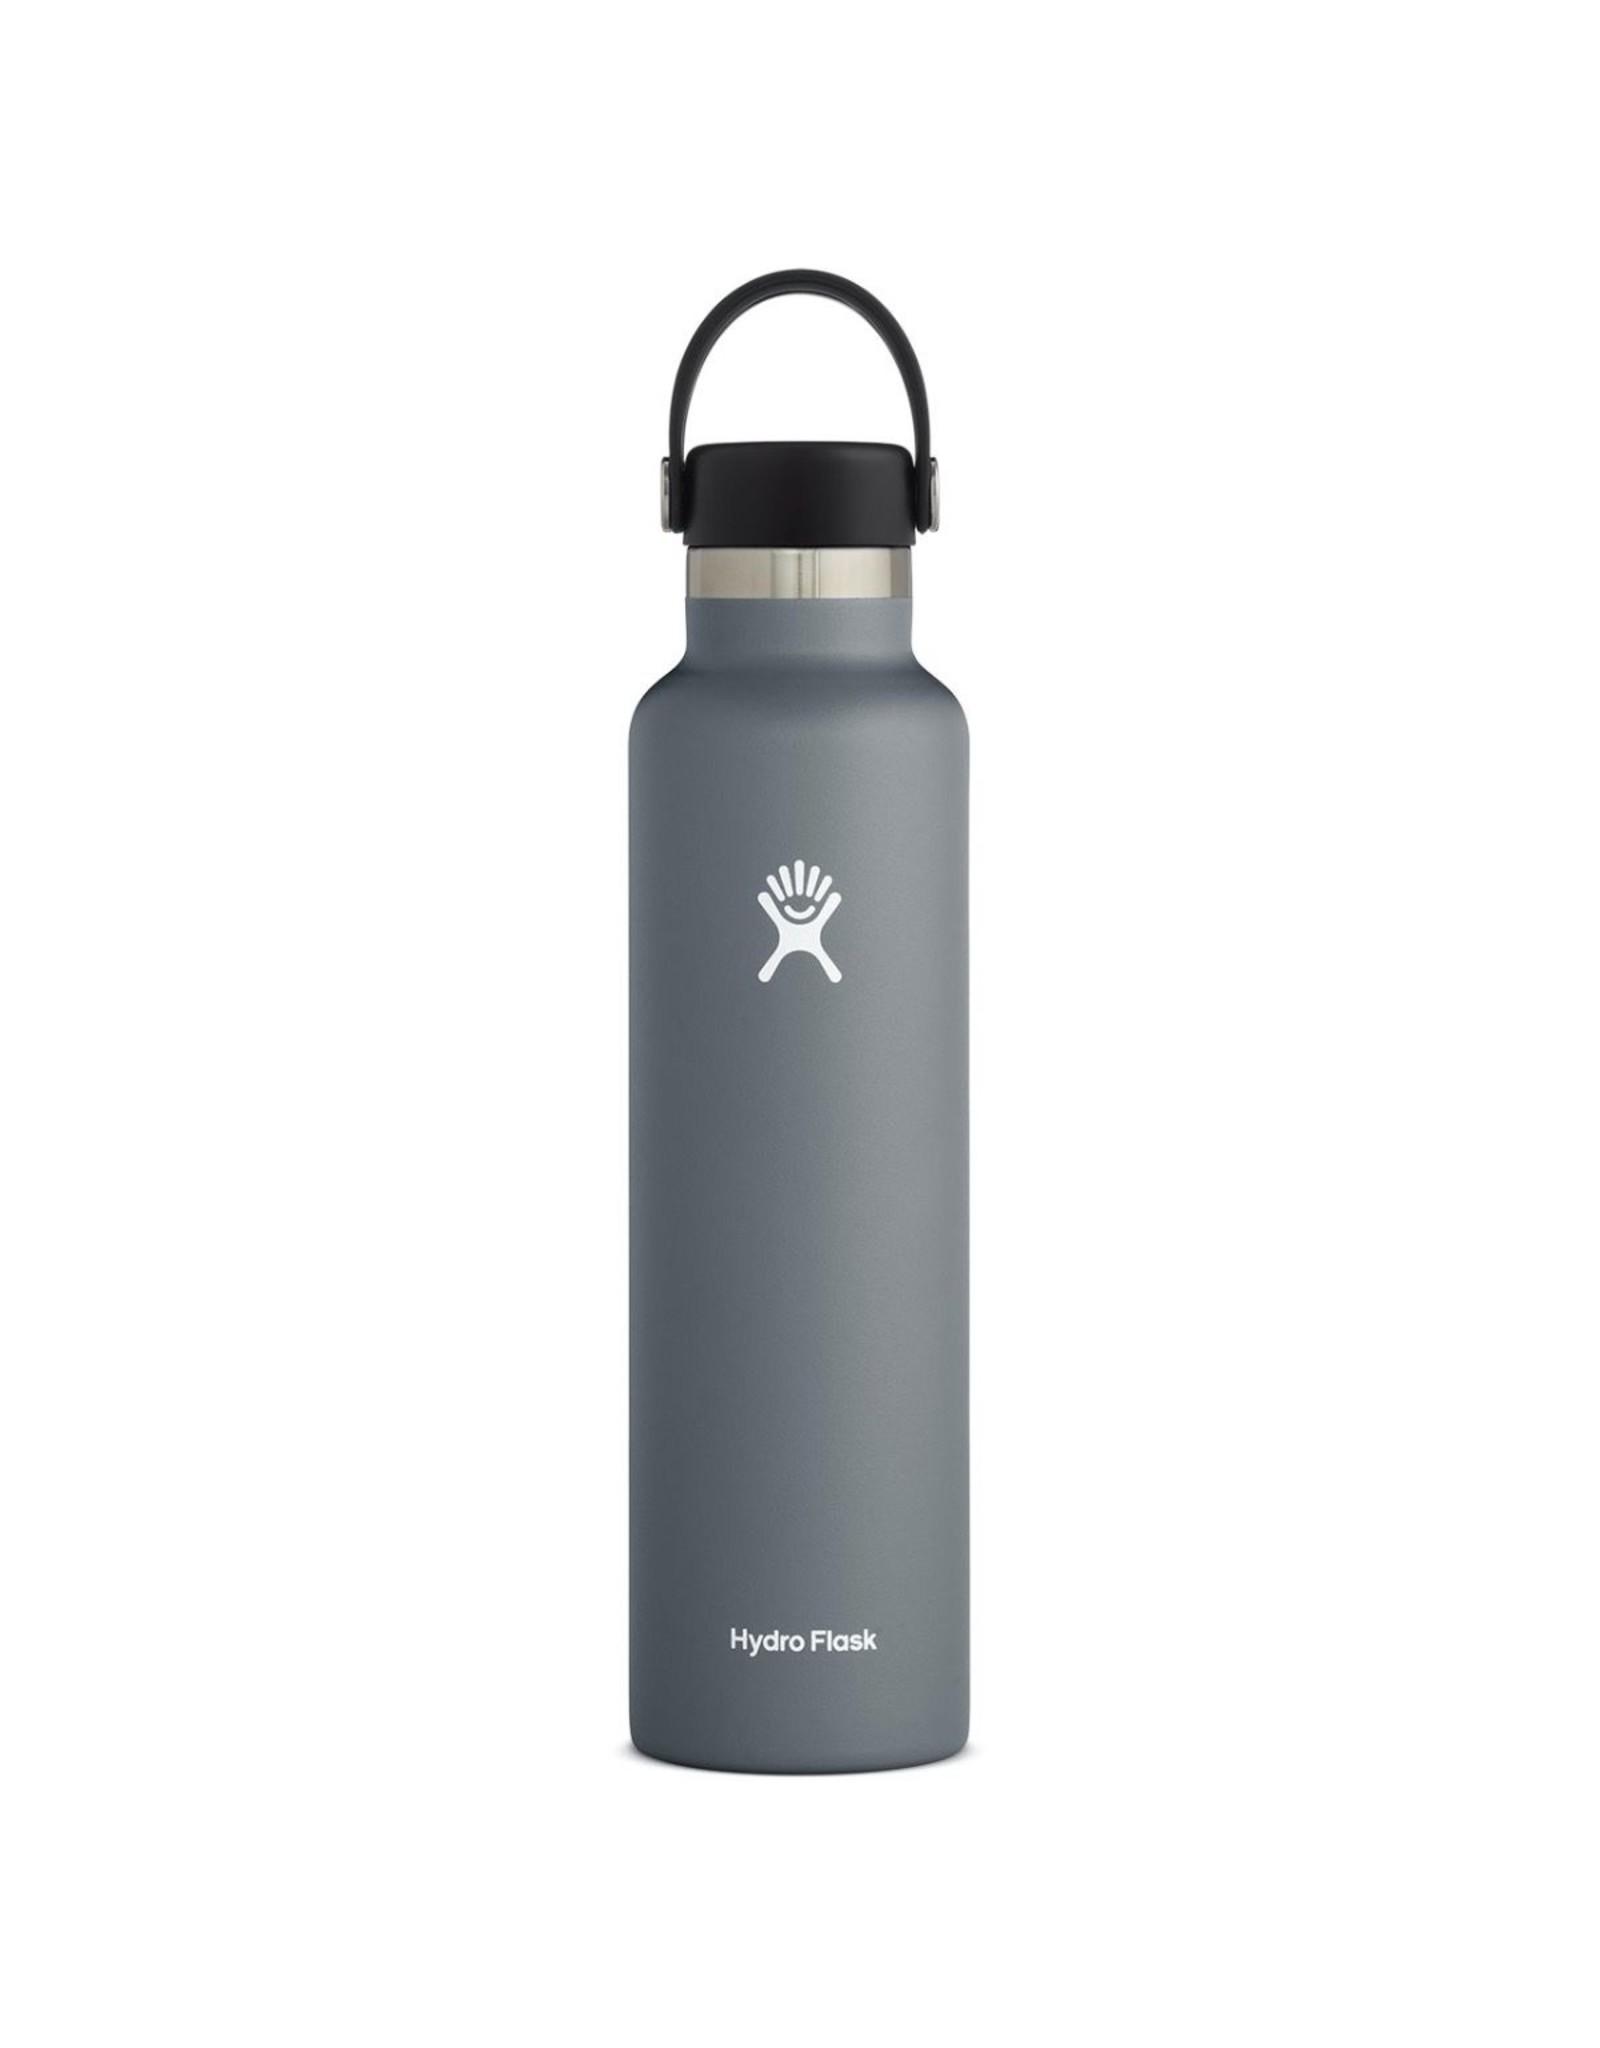 Hydro Flask Hydro Flask 24oz Standard Mouth w/ Flex Cap Stone